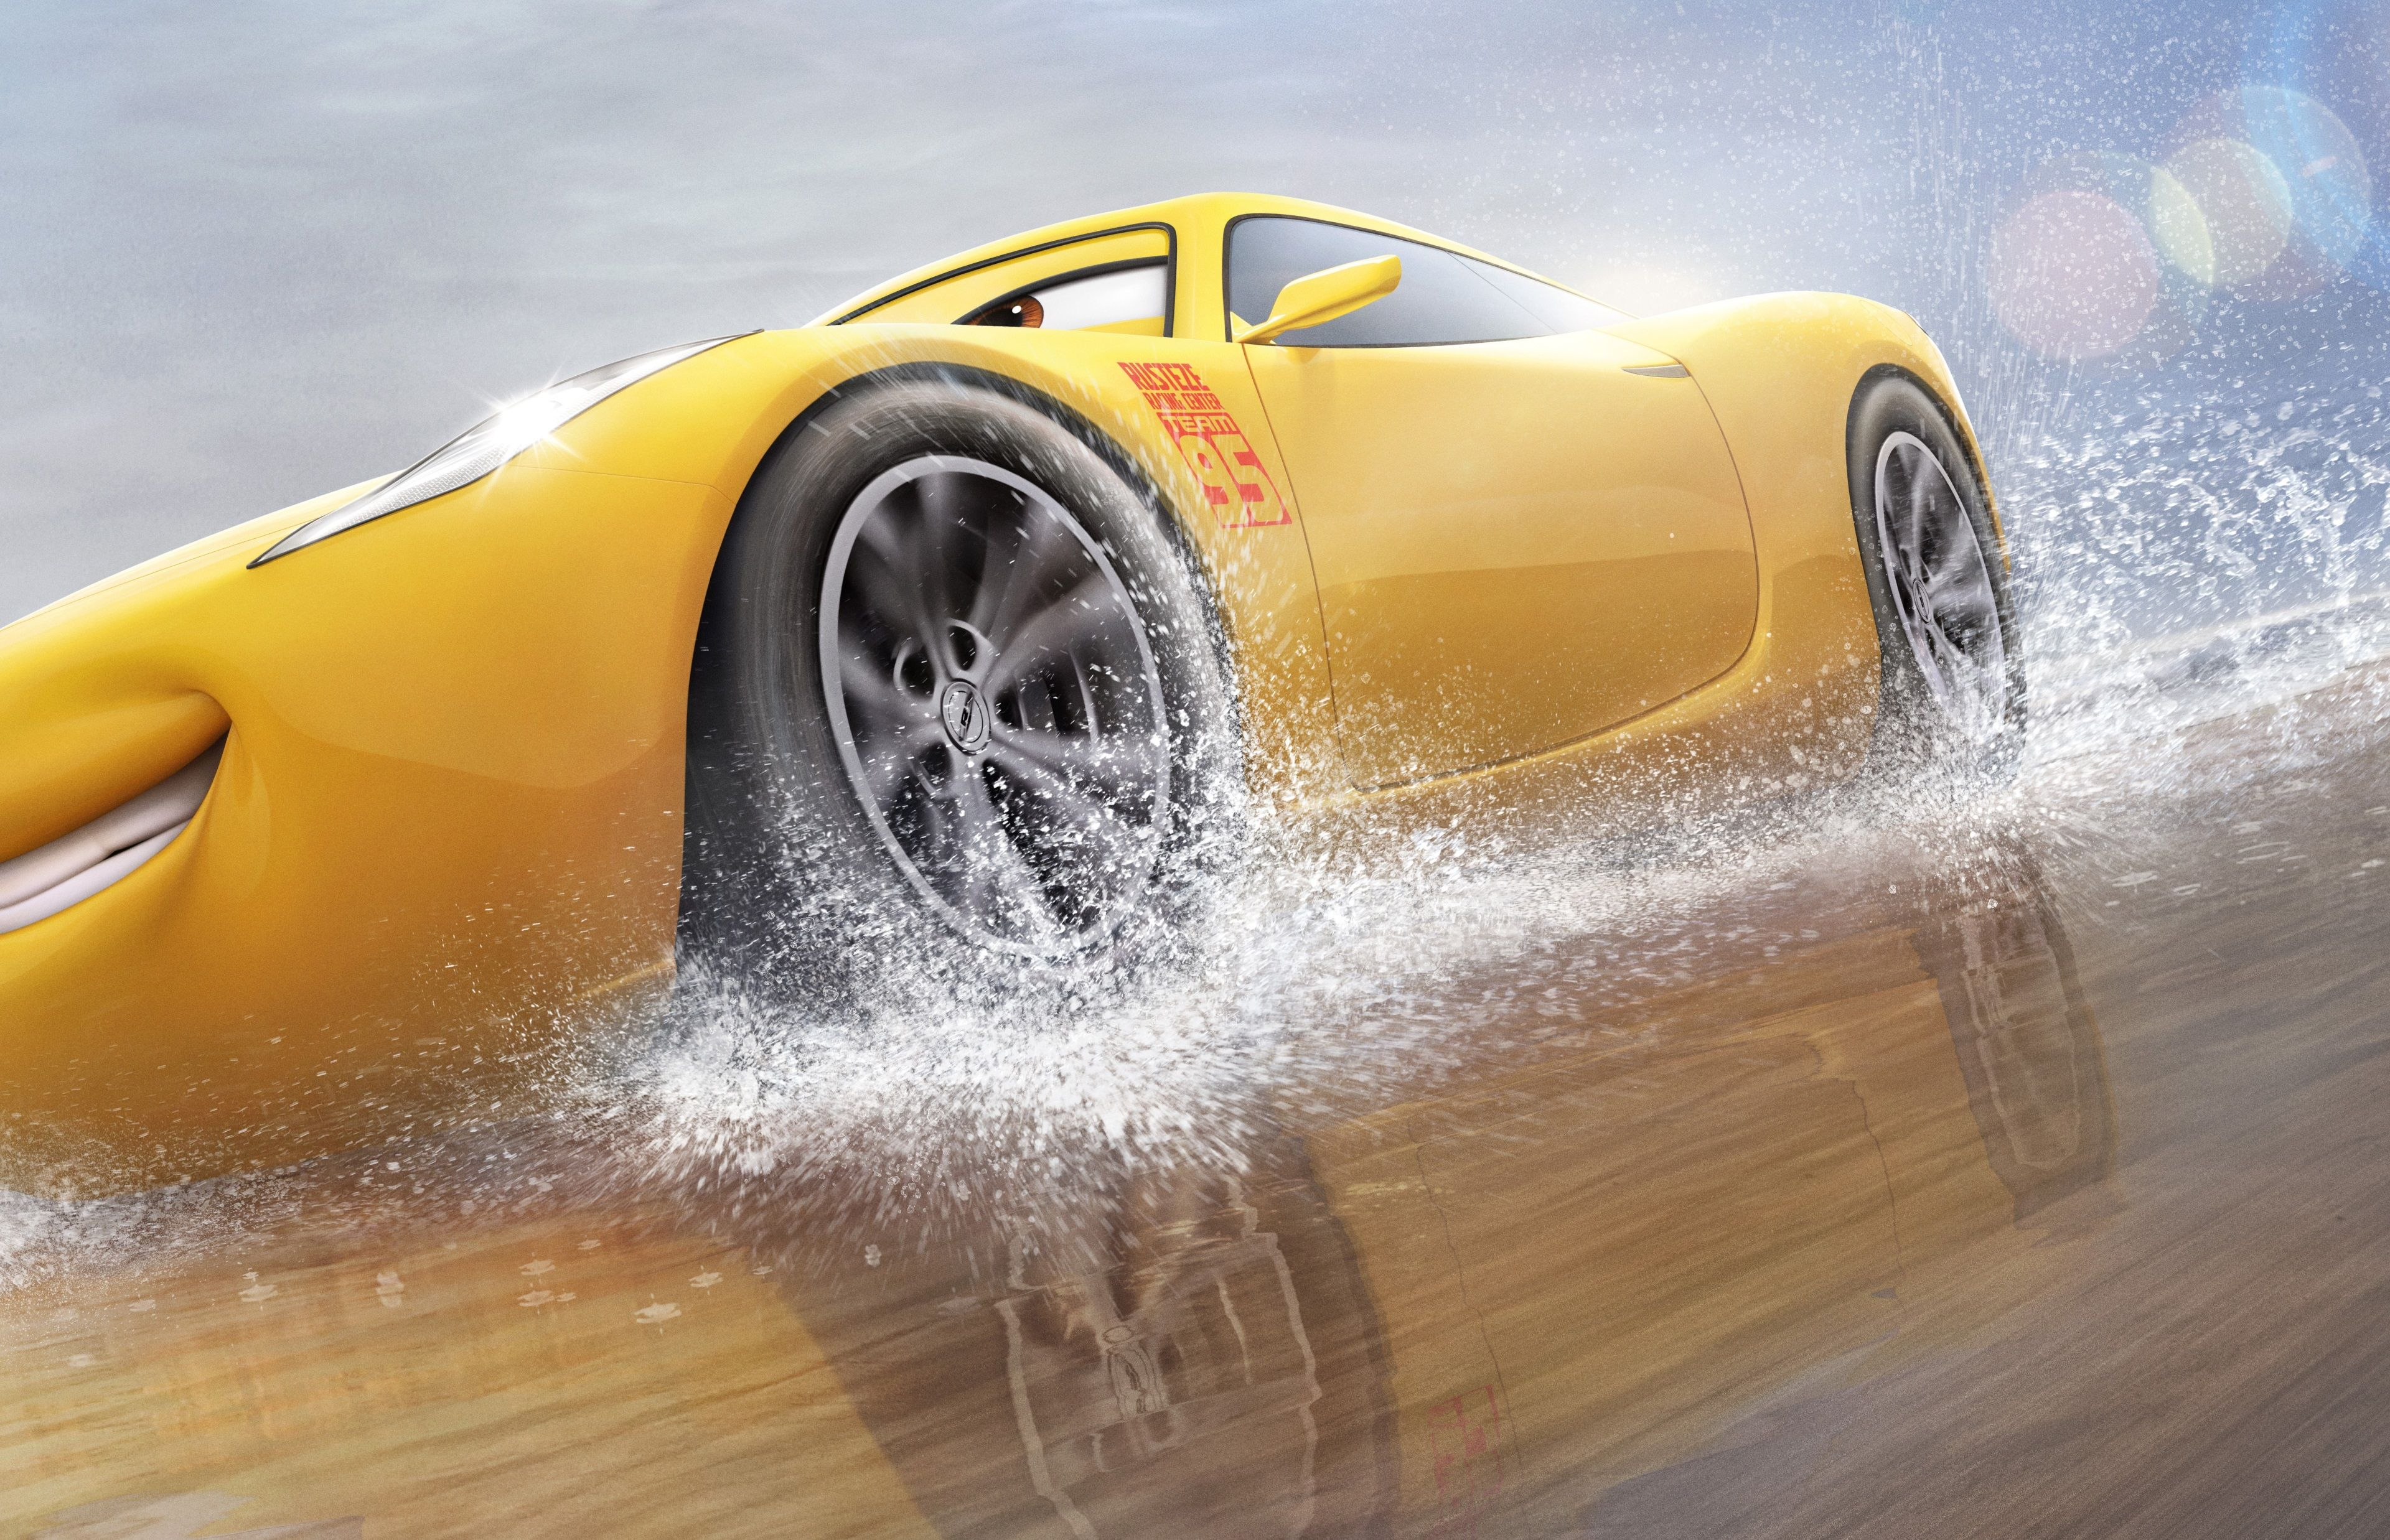 3840x2475 Cruz Ramirez 4k Wallpaper For Screen Cruz Ramirez Disney Cars Wallpaper Cars Movie